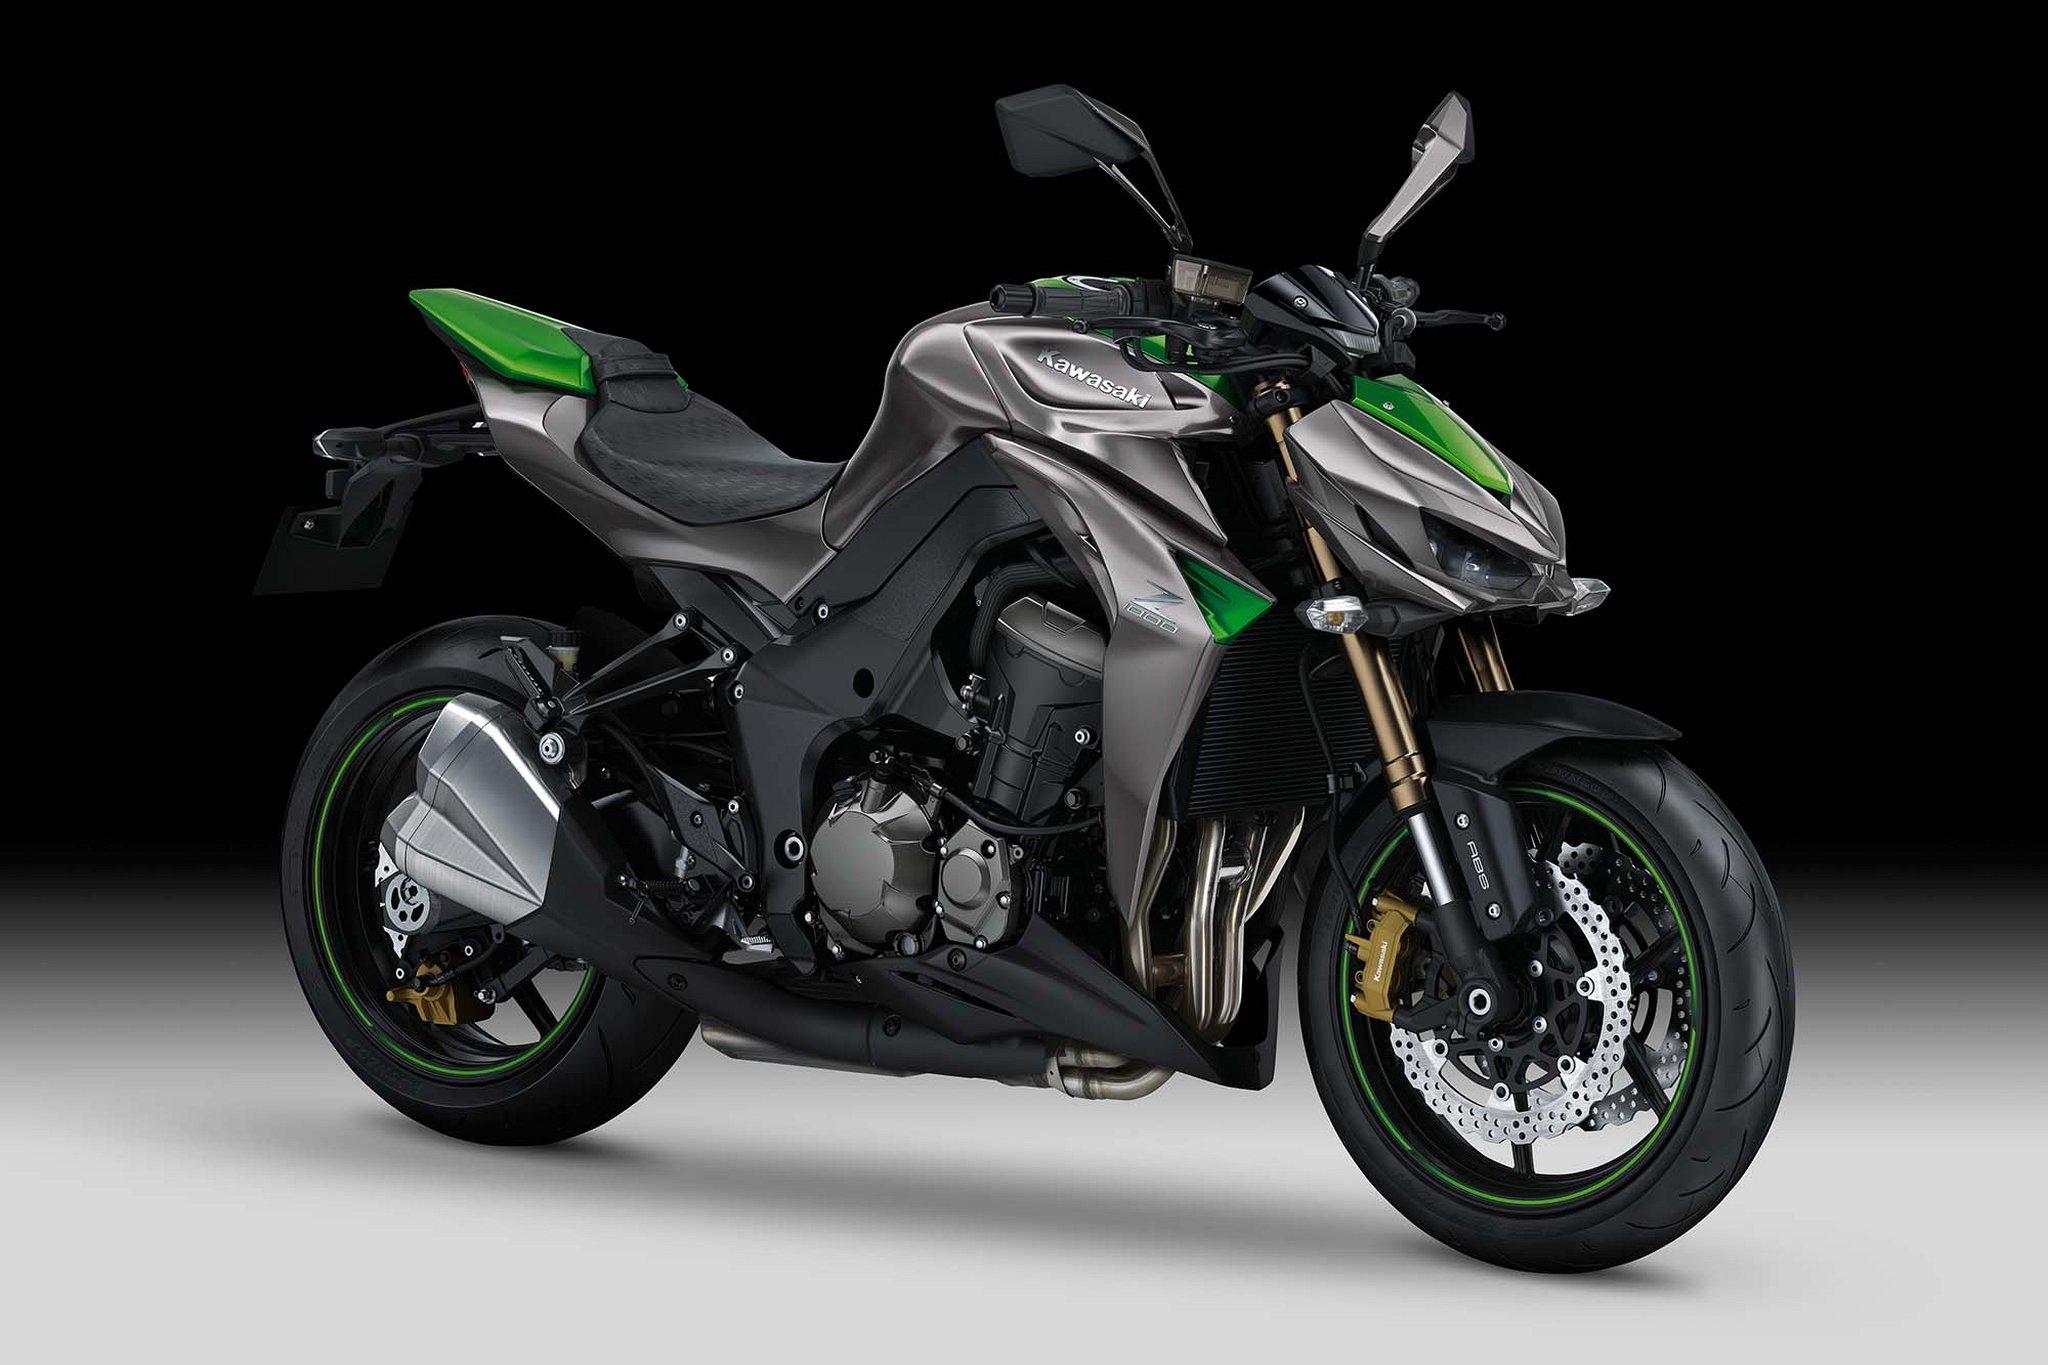 Мотоцикл Kawasaki Z1000 Special Edition 2014 Описание ...